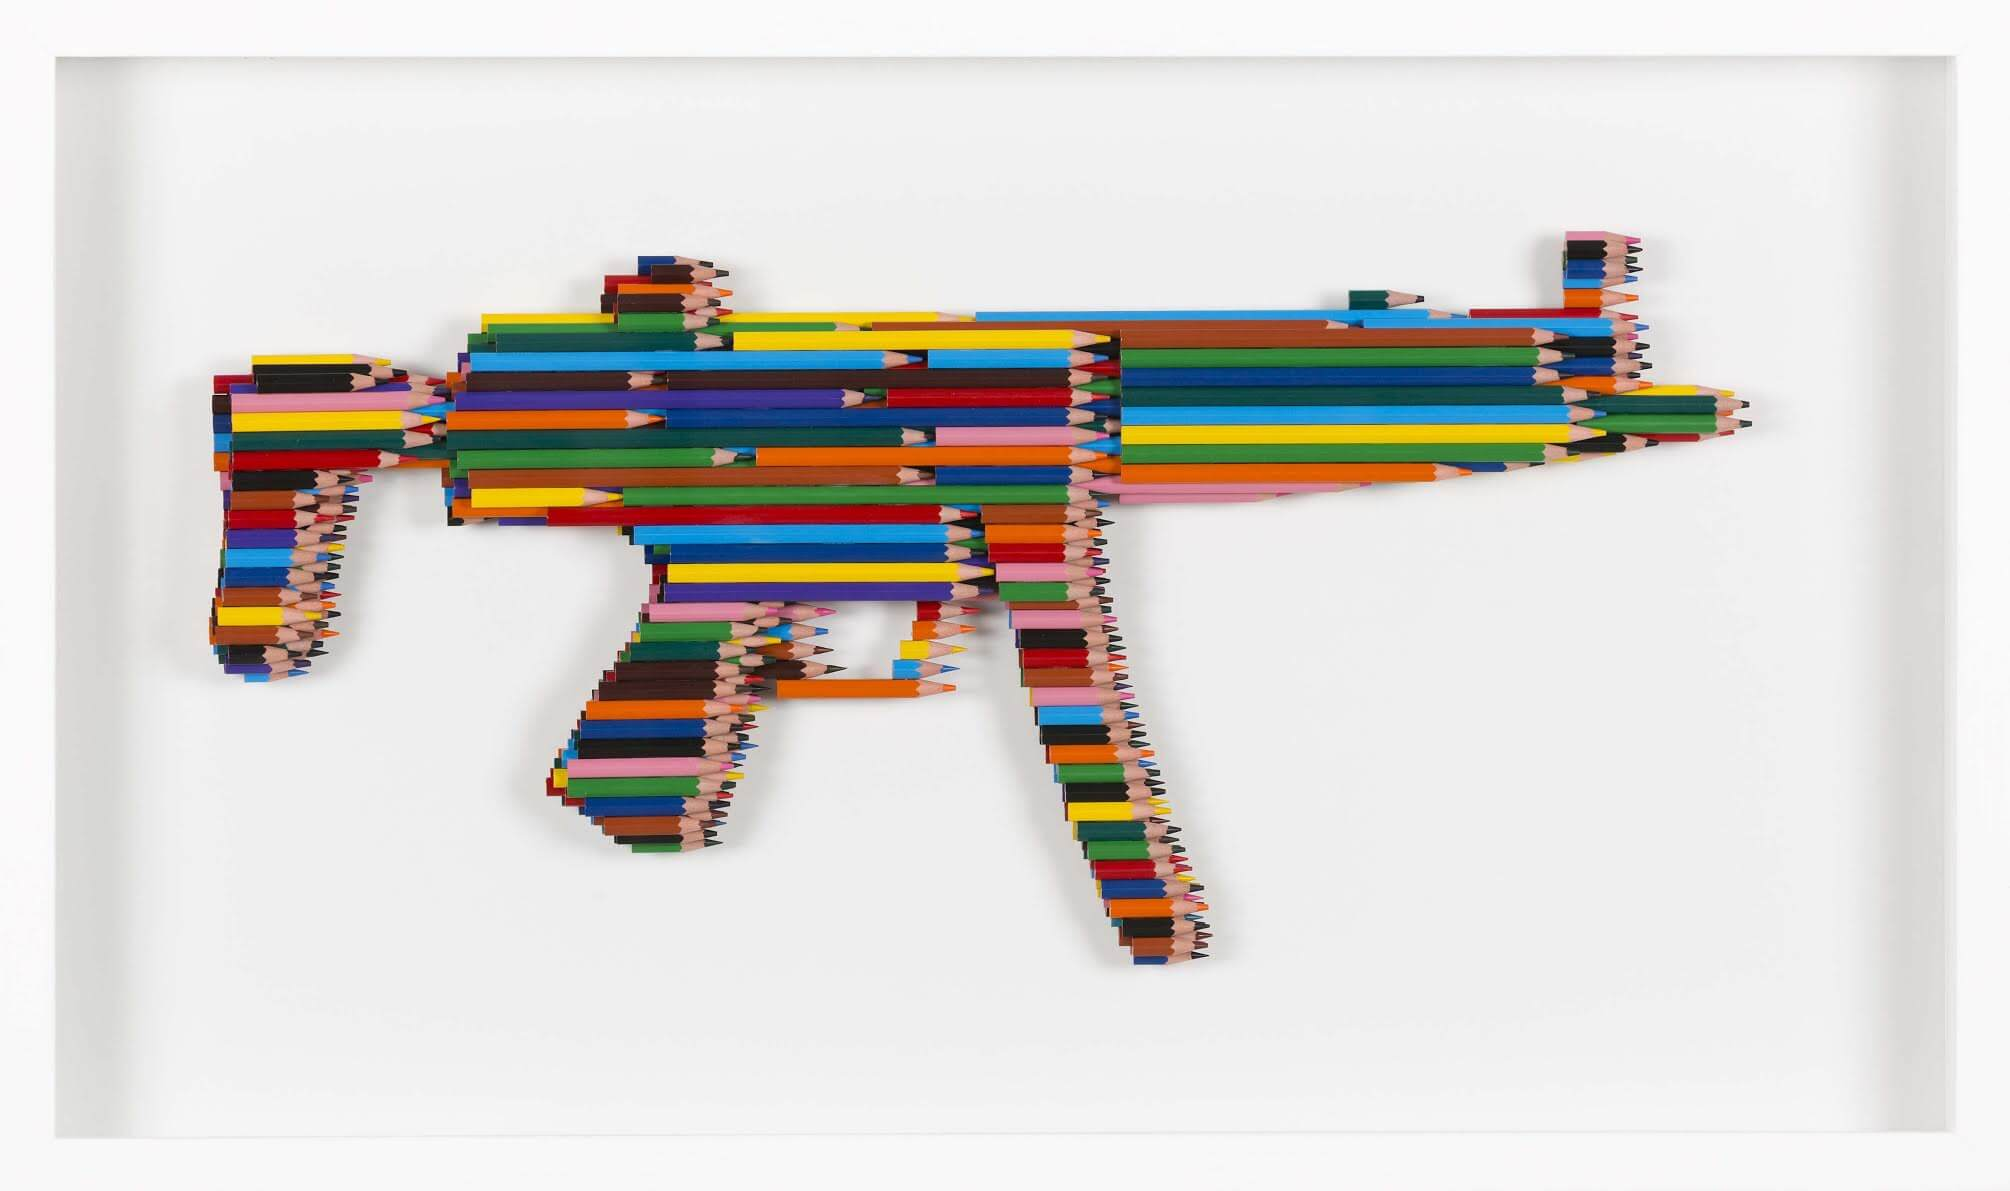 MP5 05